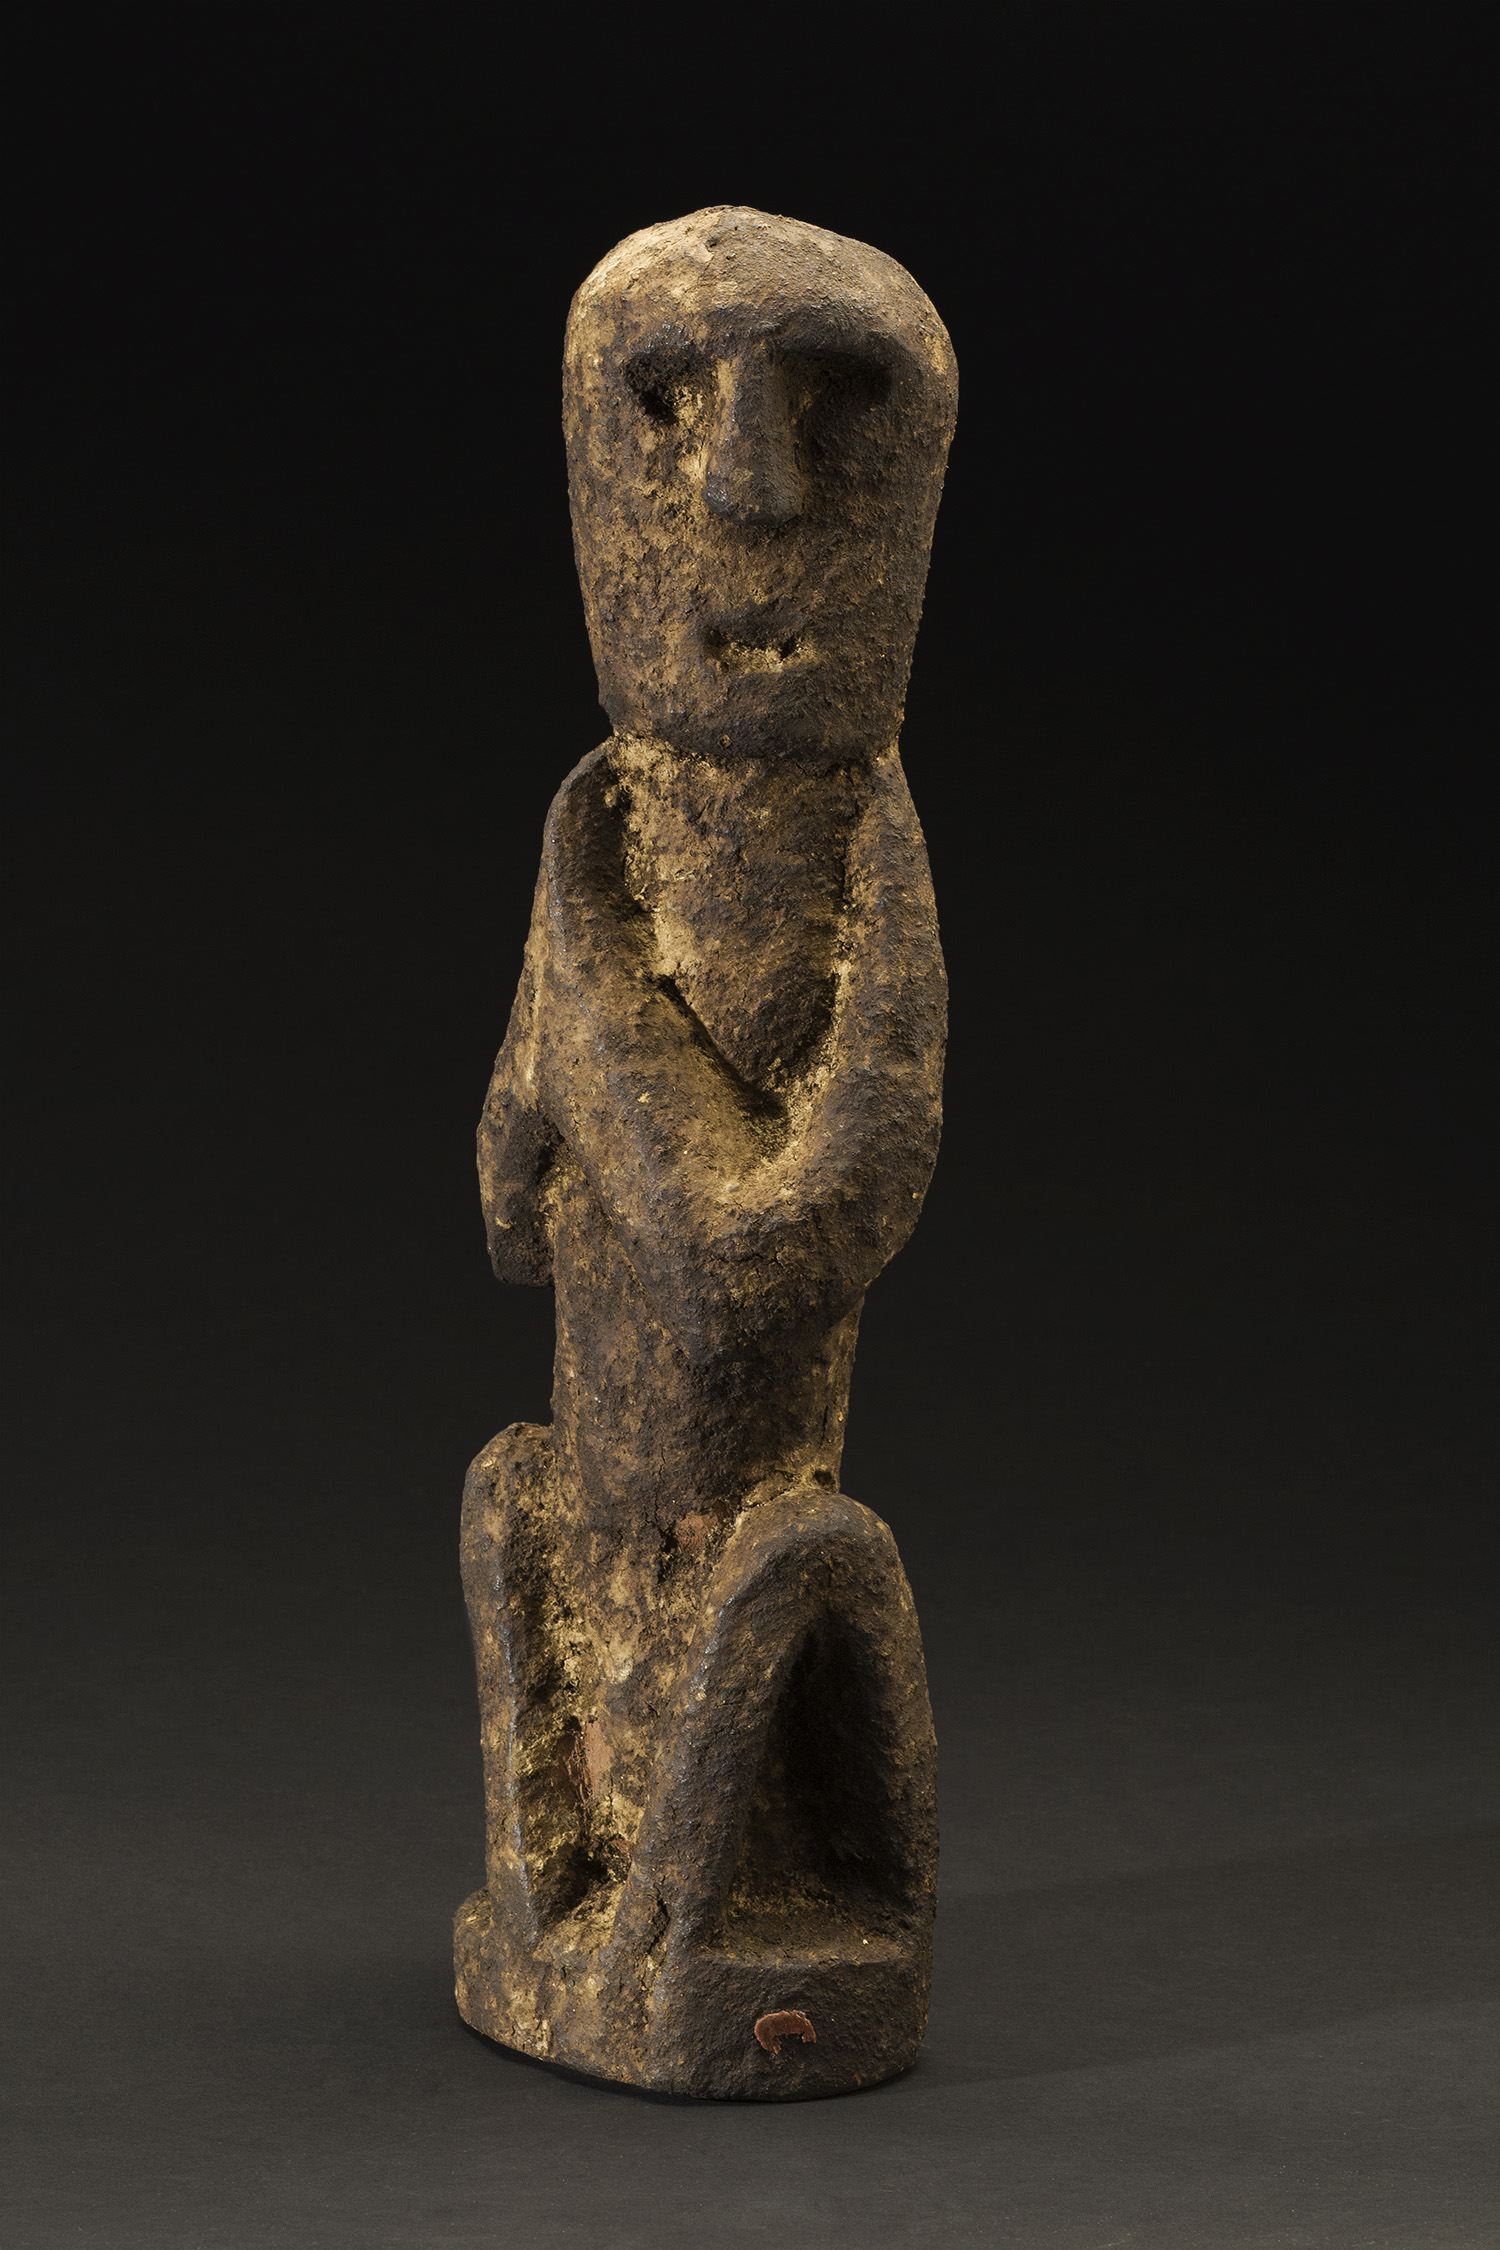 Nepal    Shrine Figure  , Mid. 20th C. Wood 15.5 x 4.5 x 3.5 inches 39.4 x 11.4 x 8.9 cm Nep 54